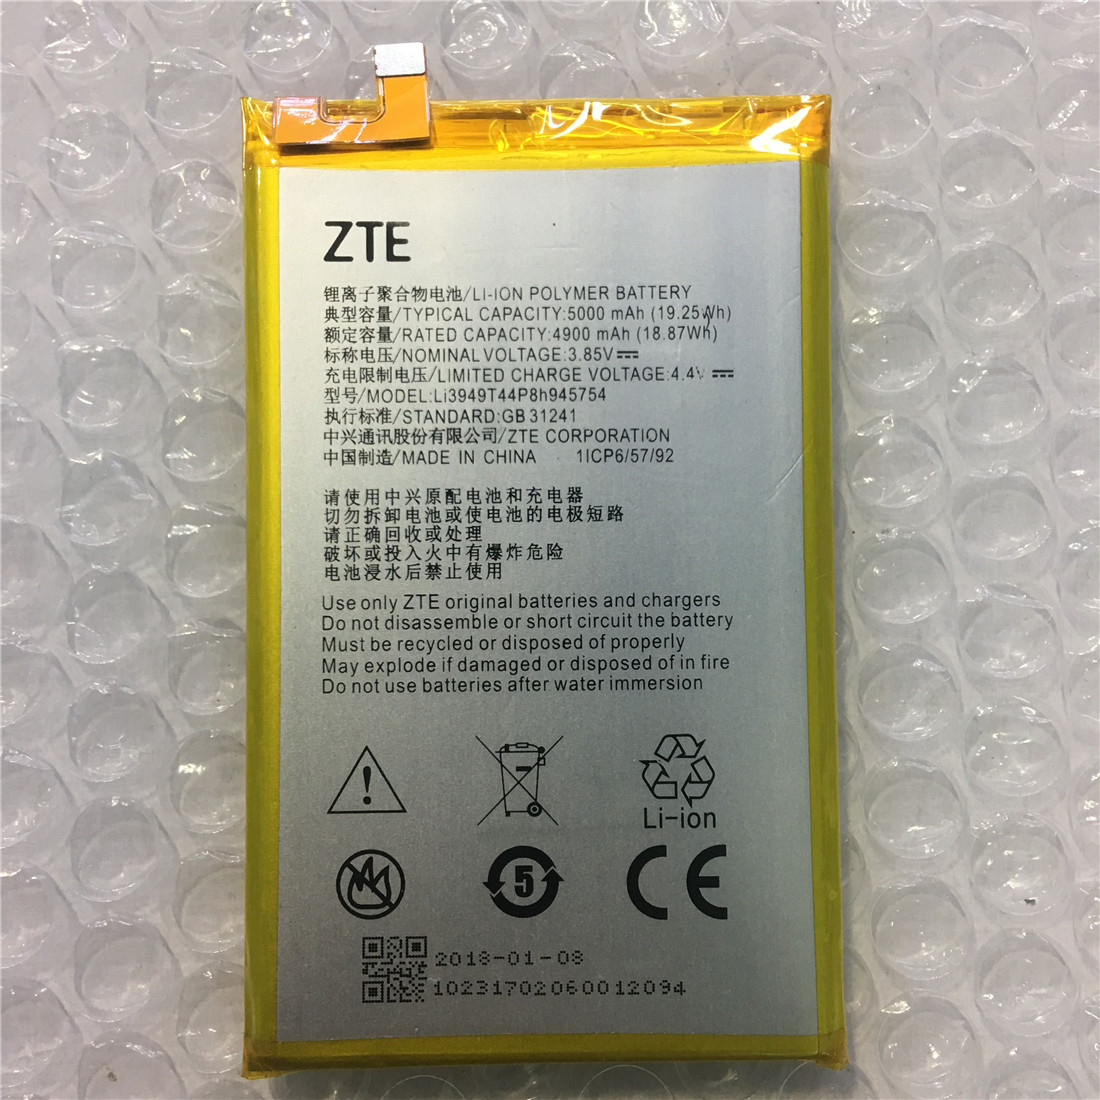 Original 5000mAh Li3949T44P8h945754 Battery For ZTE Blade A2 Plus BV0730 A2Plus / ZTE Blade A610 Plus Battery